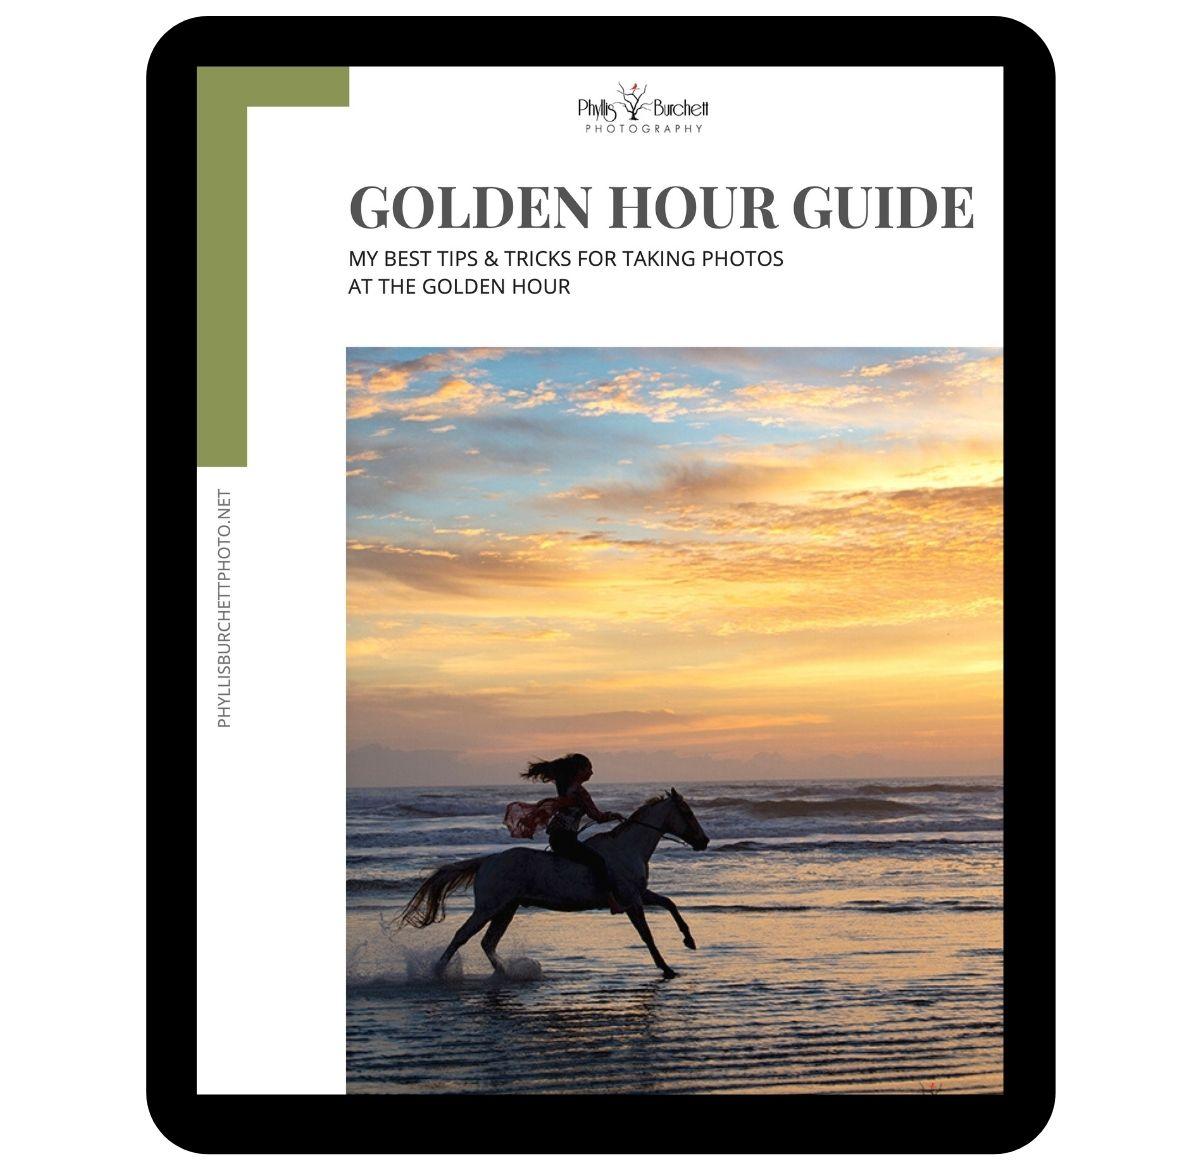 golden hour guide